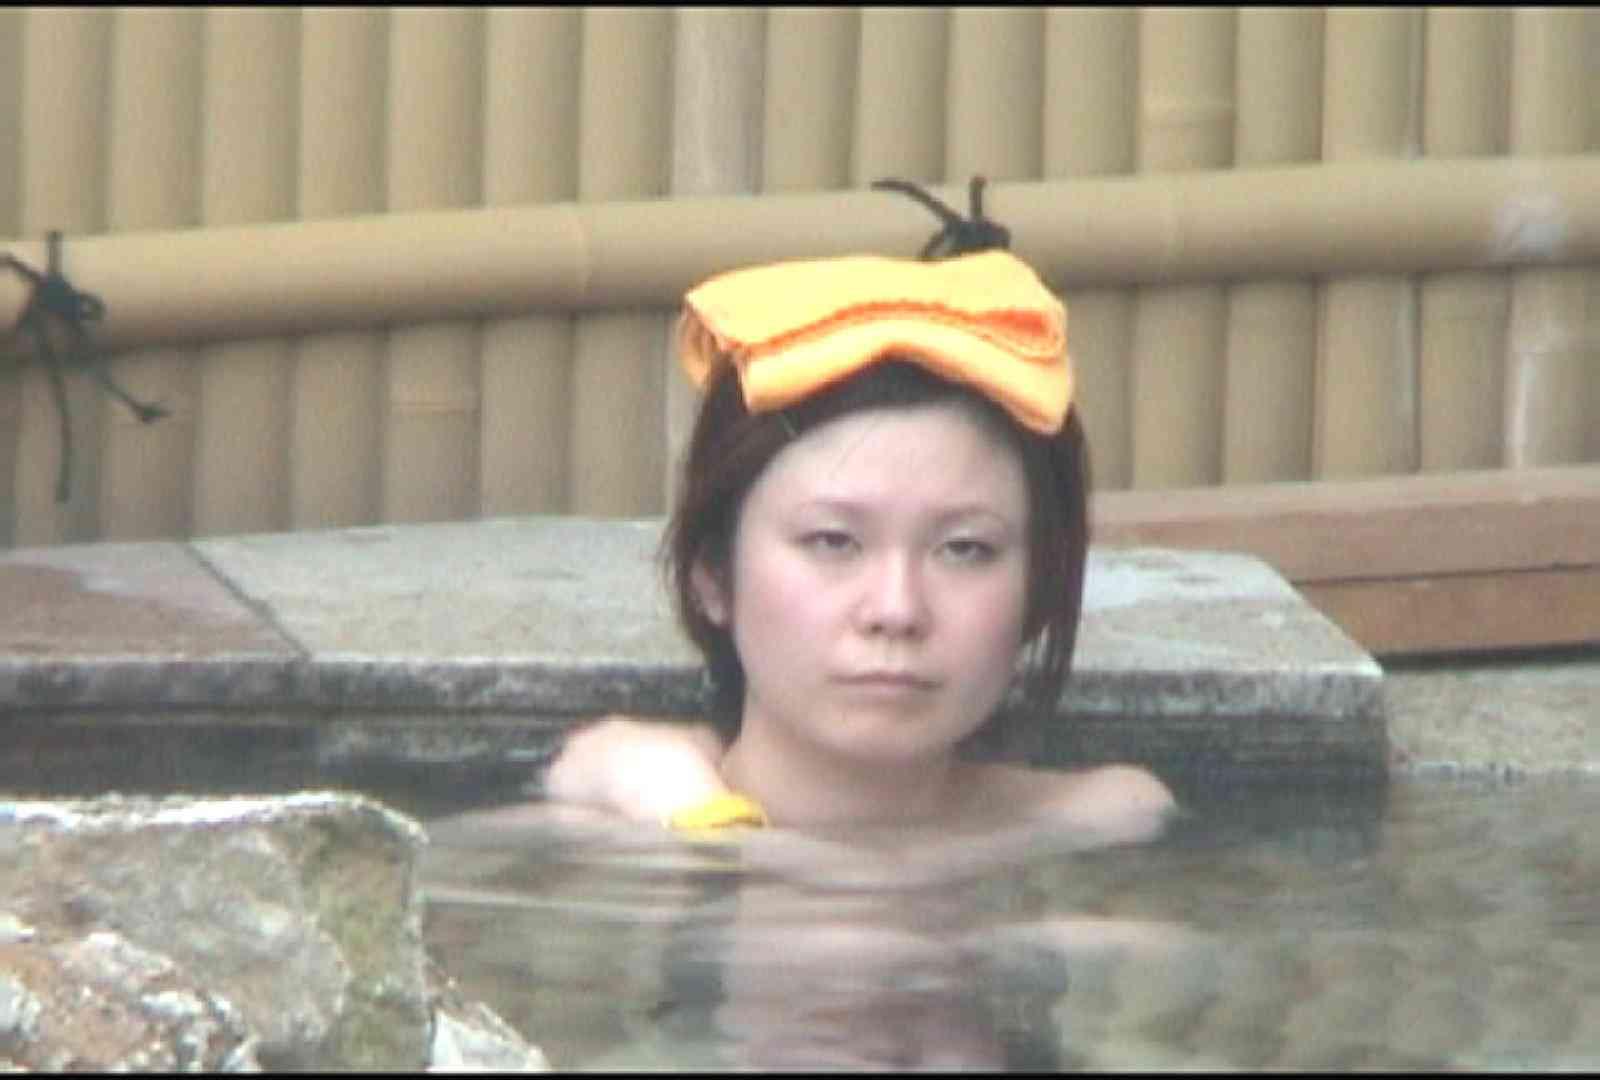 Aquaな露天風呂Vol.177 盗撮師作品  102pic 12